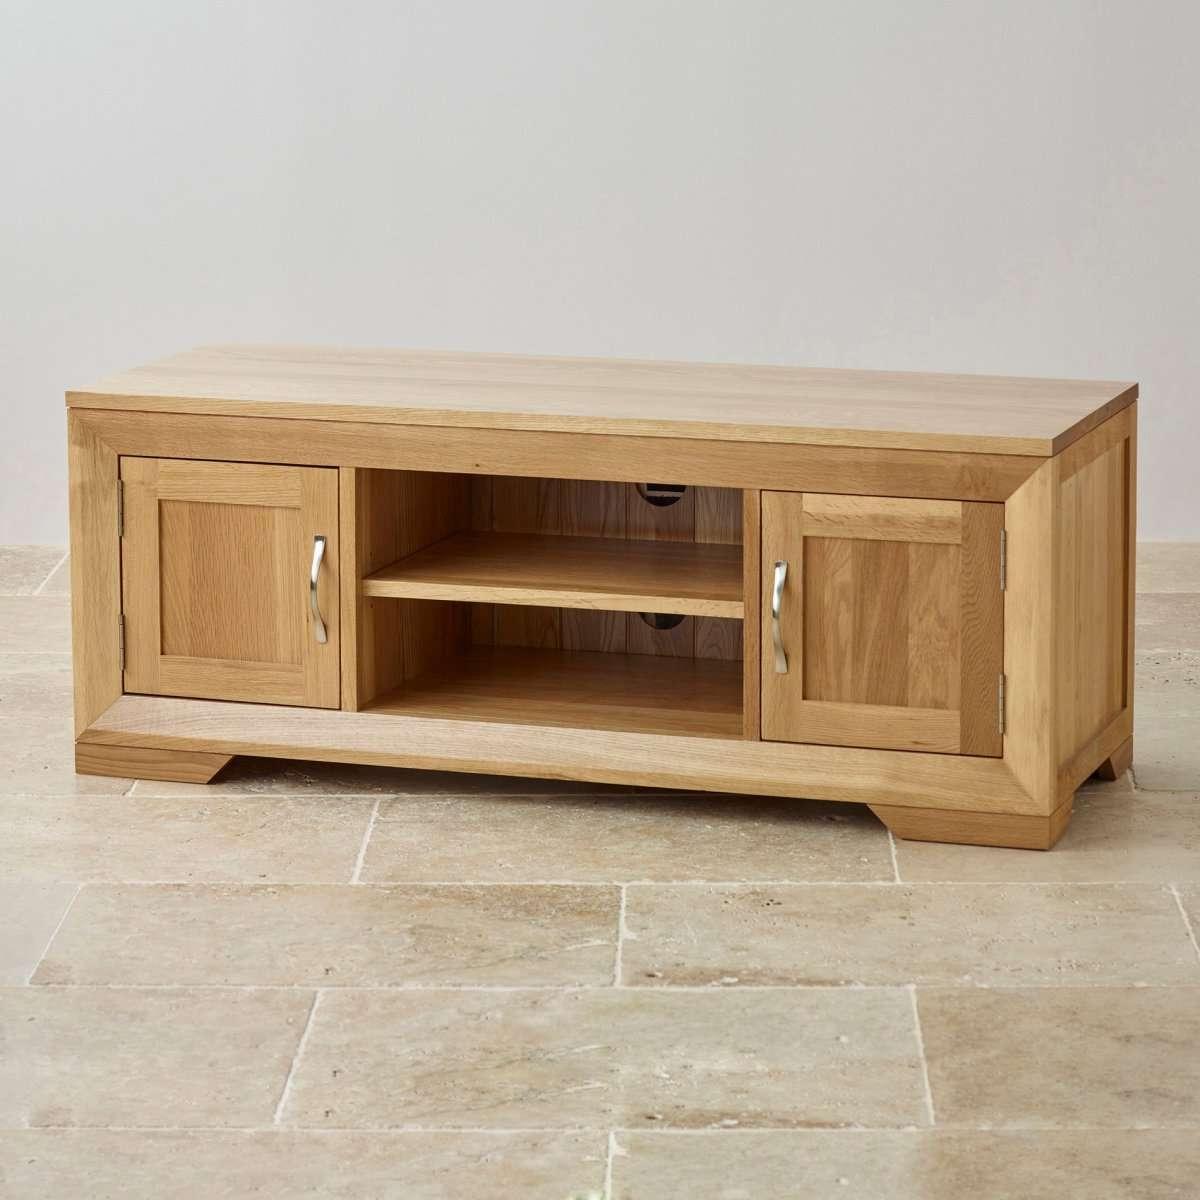 Unfinished Oak Tv Stand : Innovative Designs Oak Tv Console Regarding Cheap Oak Tv Stands (View 13 of 15)